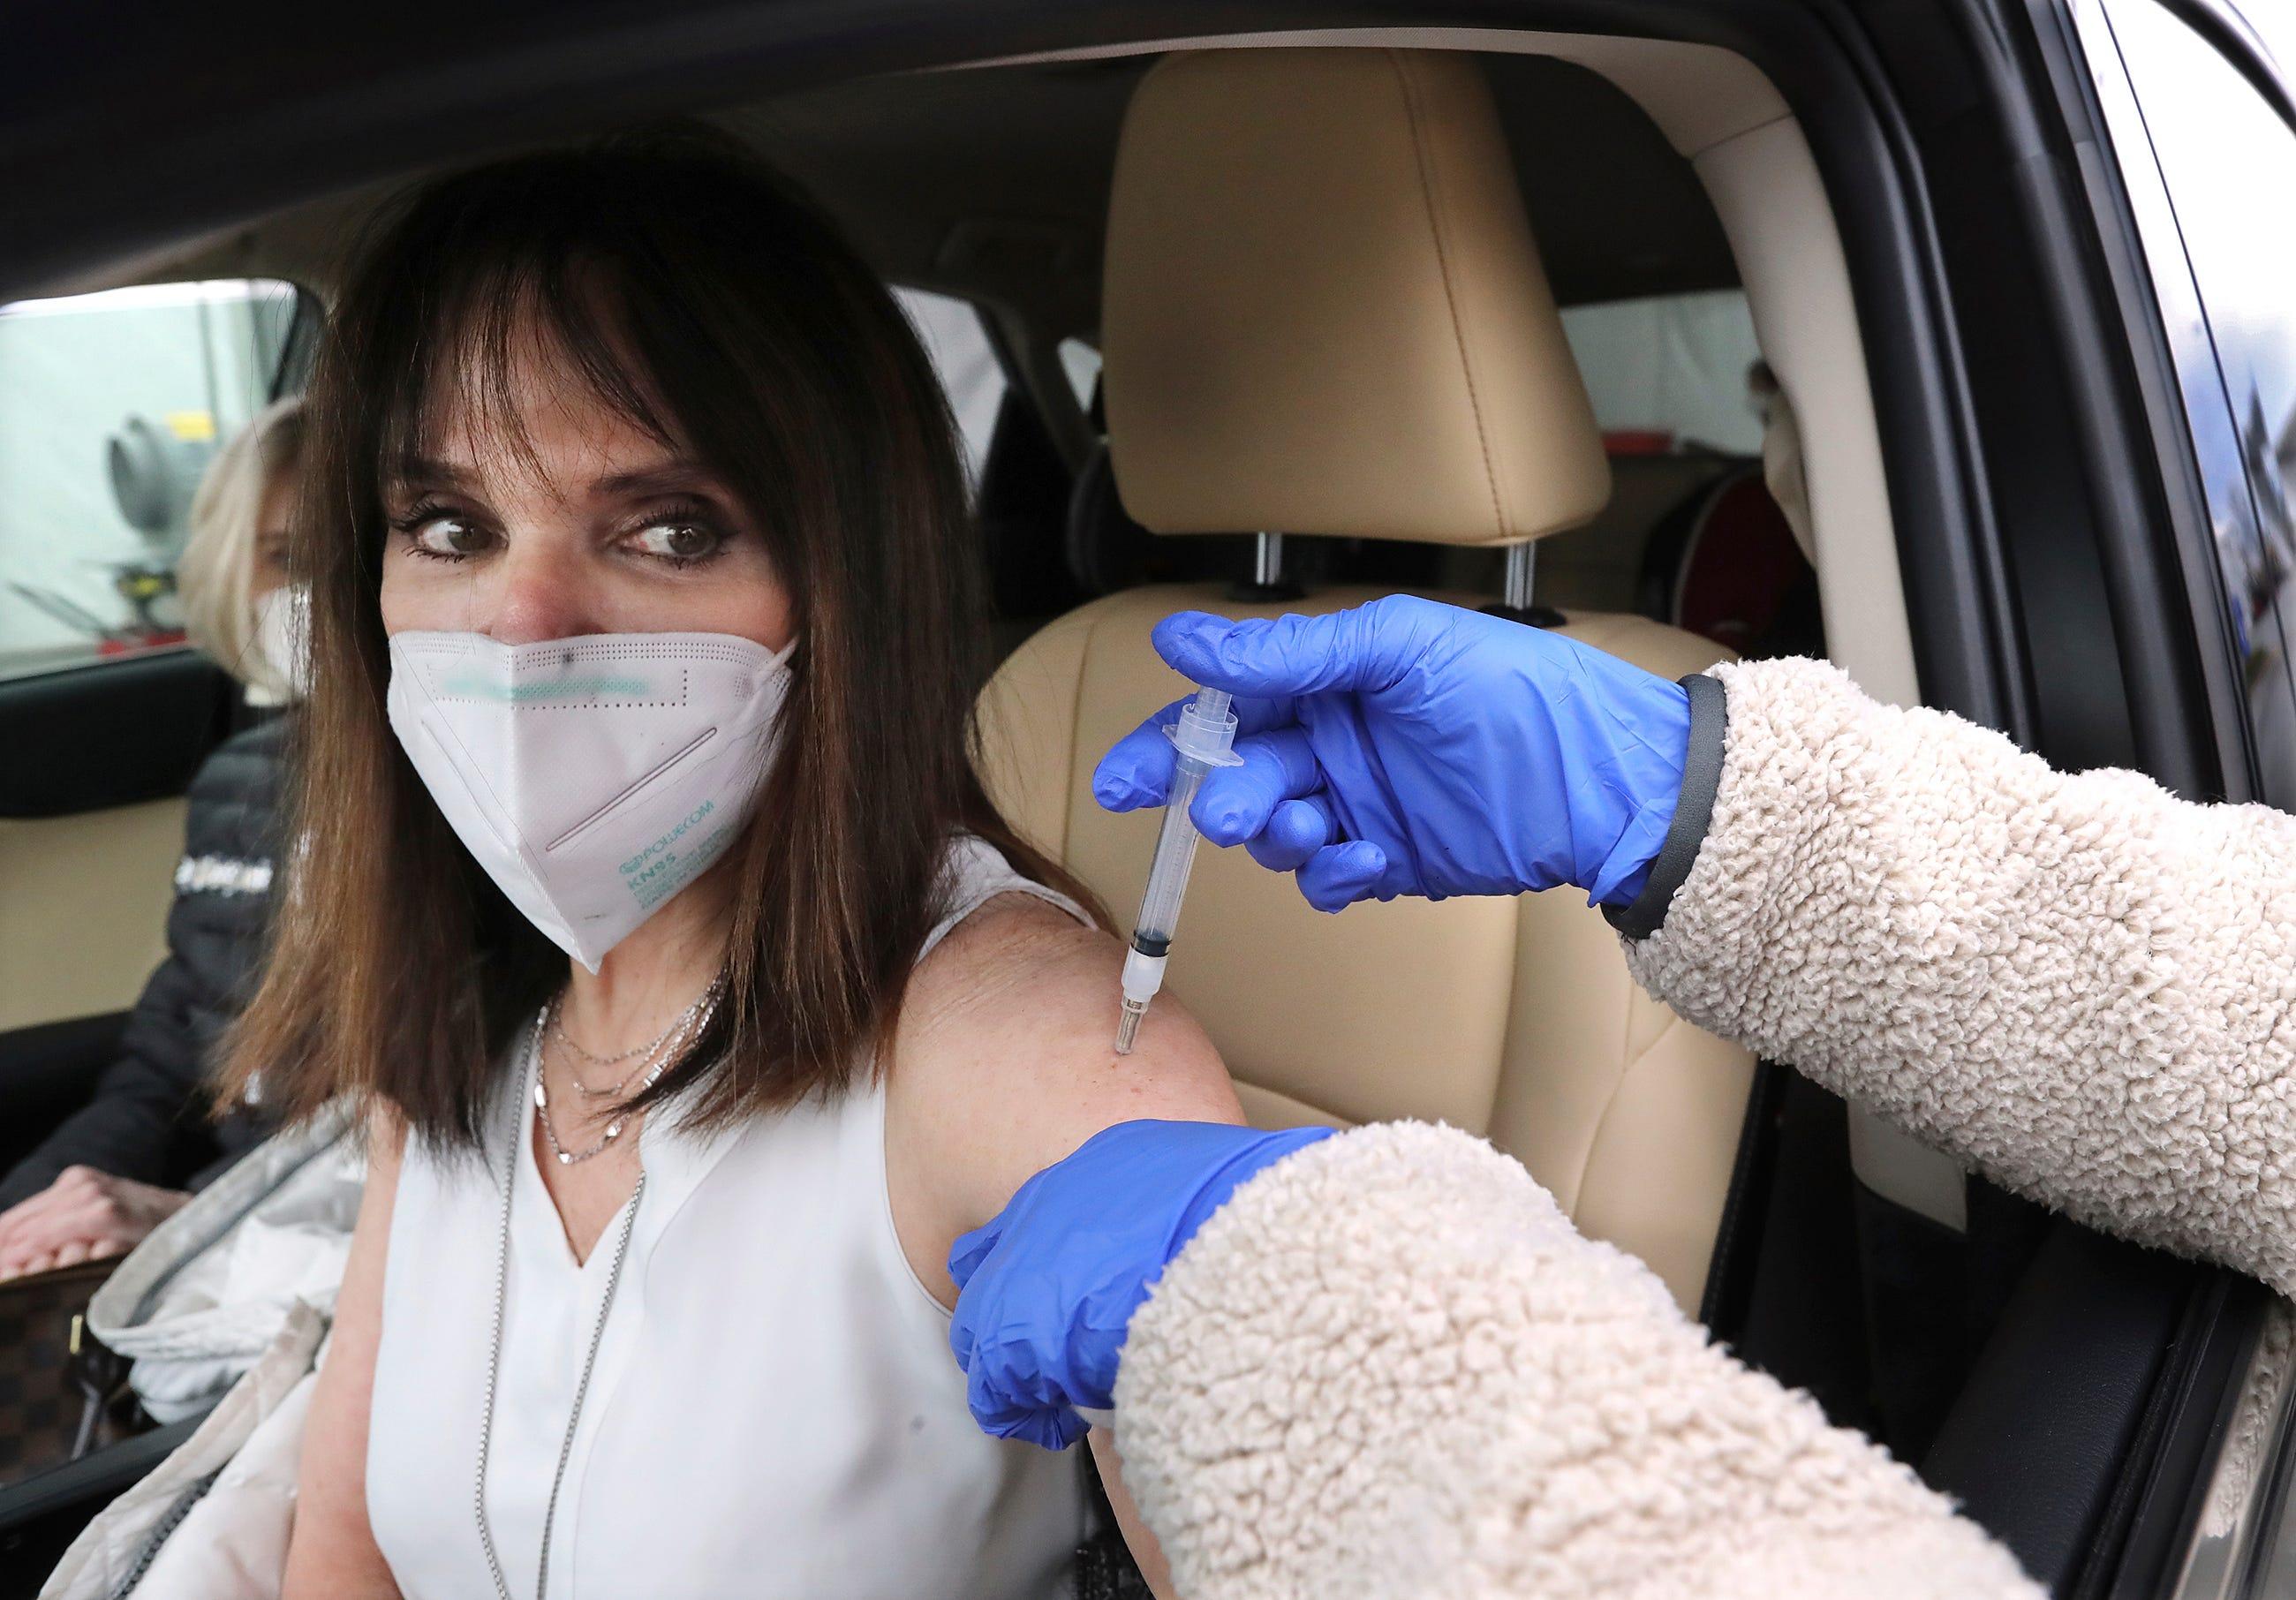 Coronavirus updates: Virus claims member of famed Tuskegee Airmen; Queen Elizabeth gets vaccinated